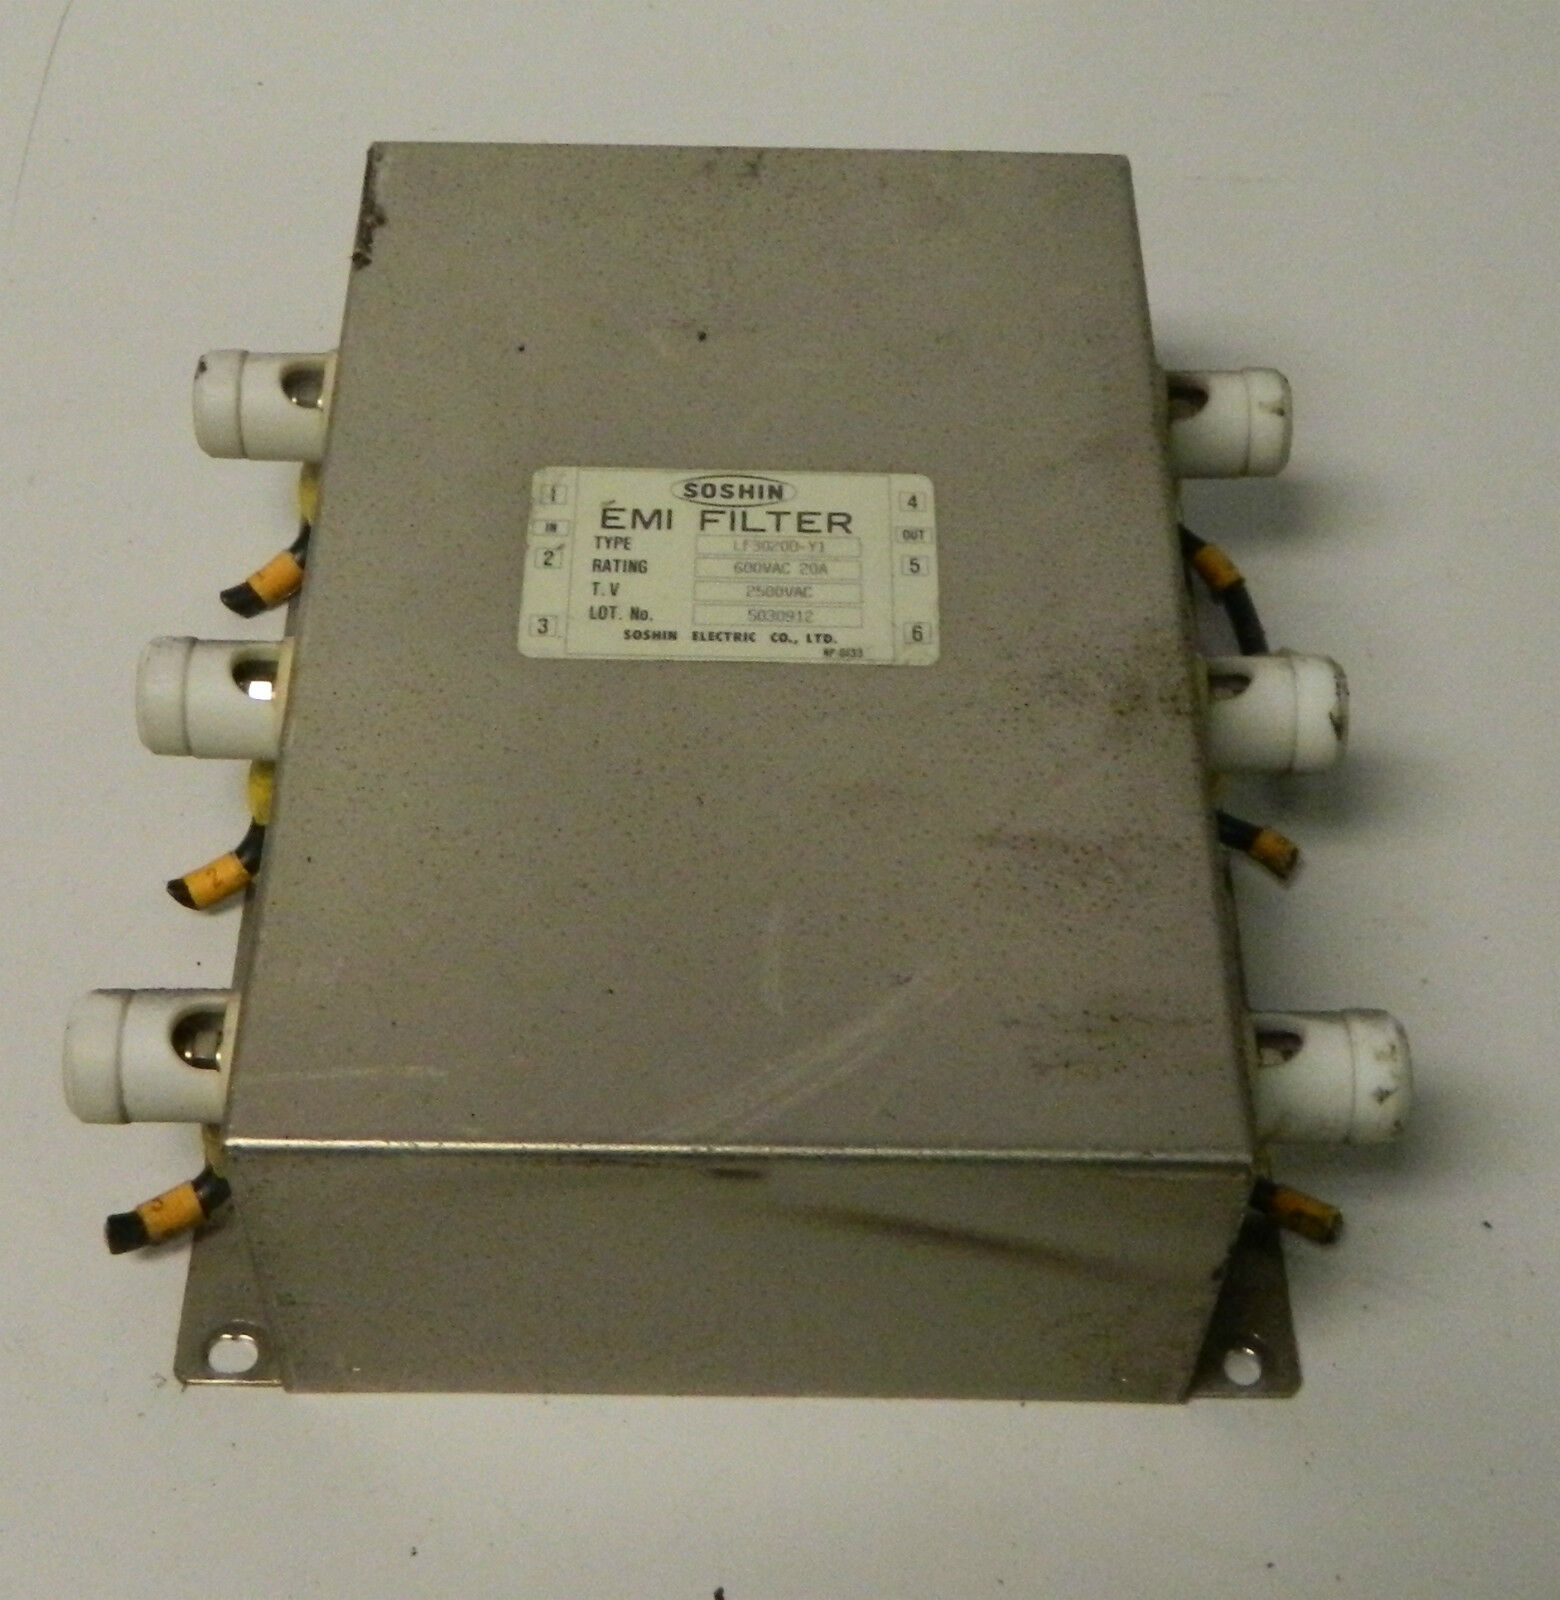 Soshin Emi Filtro De De De Fanuc Robocut Wire Edm, Mod  lf3005a-y1, Usado f41810